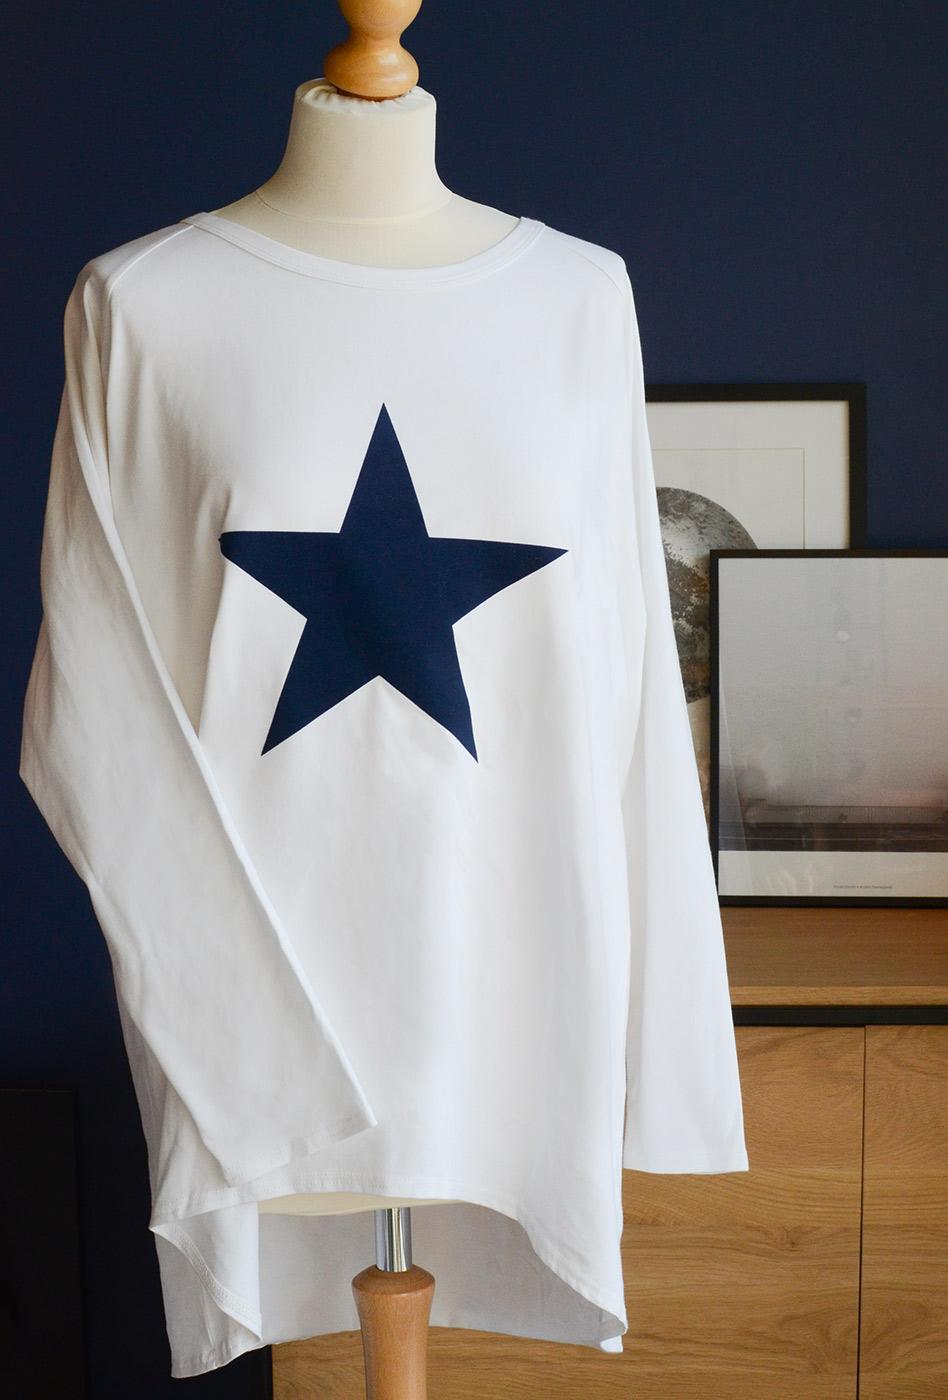 large-star-lounge-top-navy-&-white